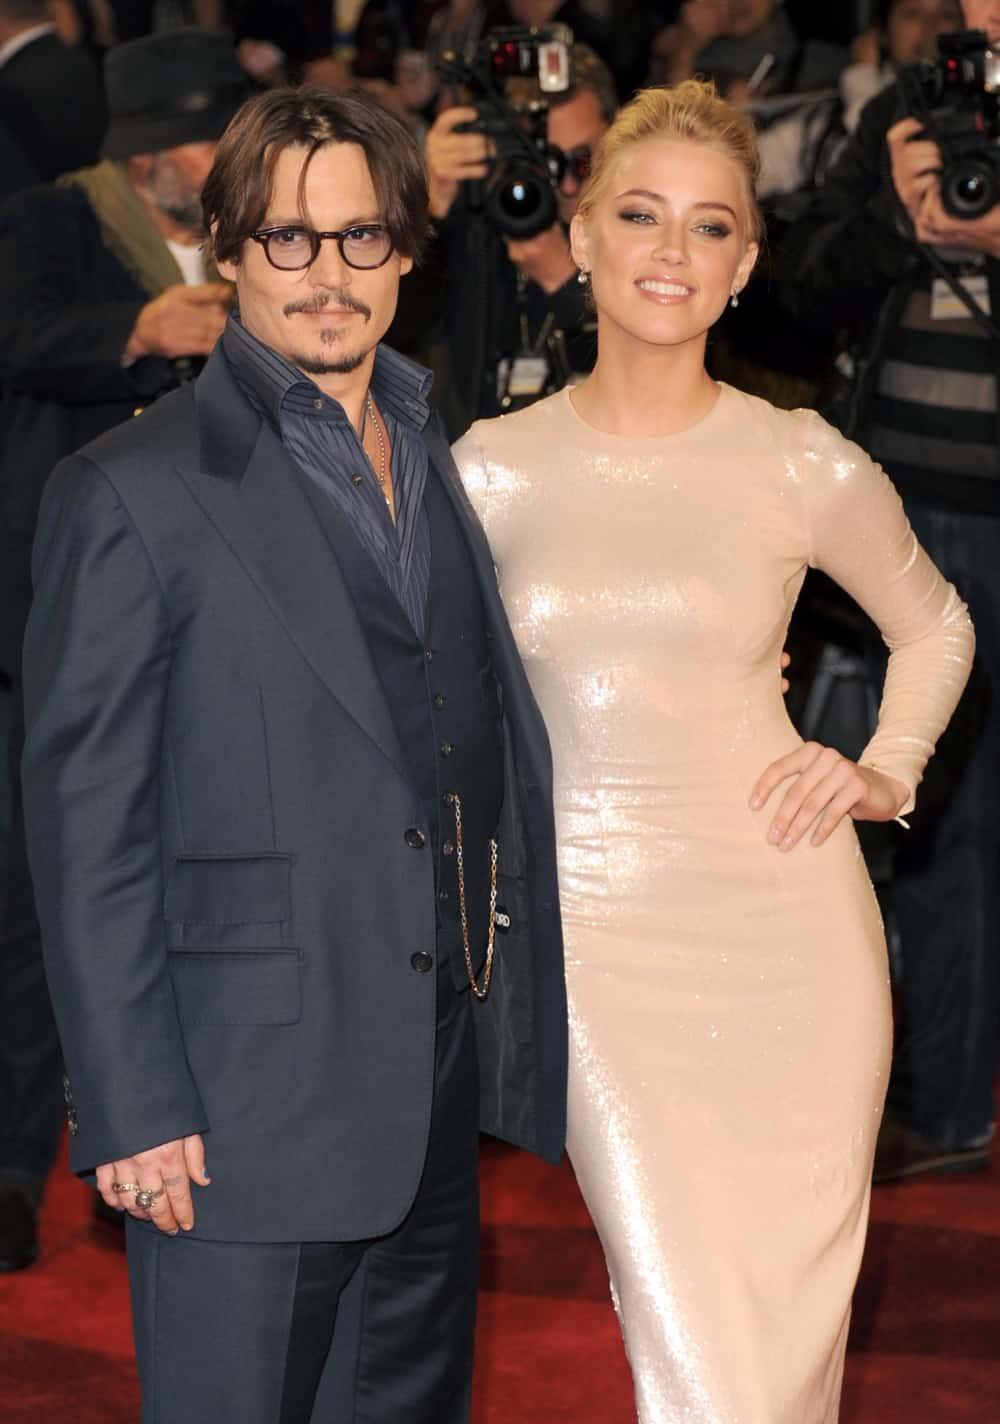 Amber Heard and Johnny Depp The Rum Diary - European Premiere